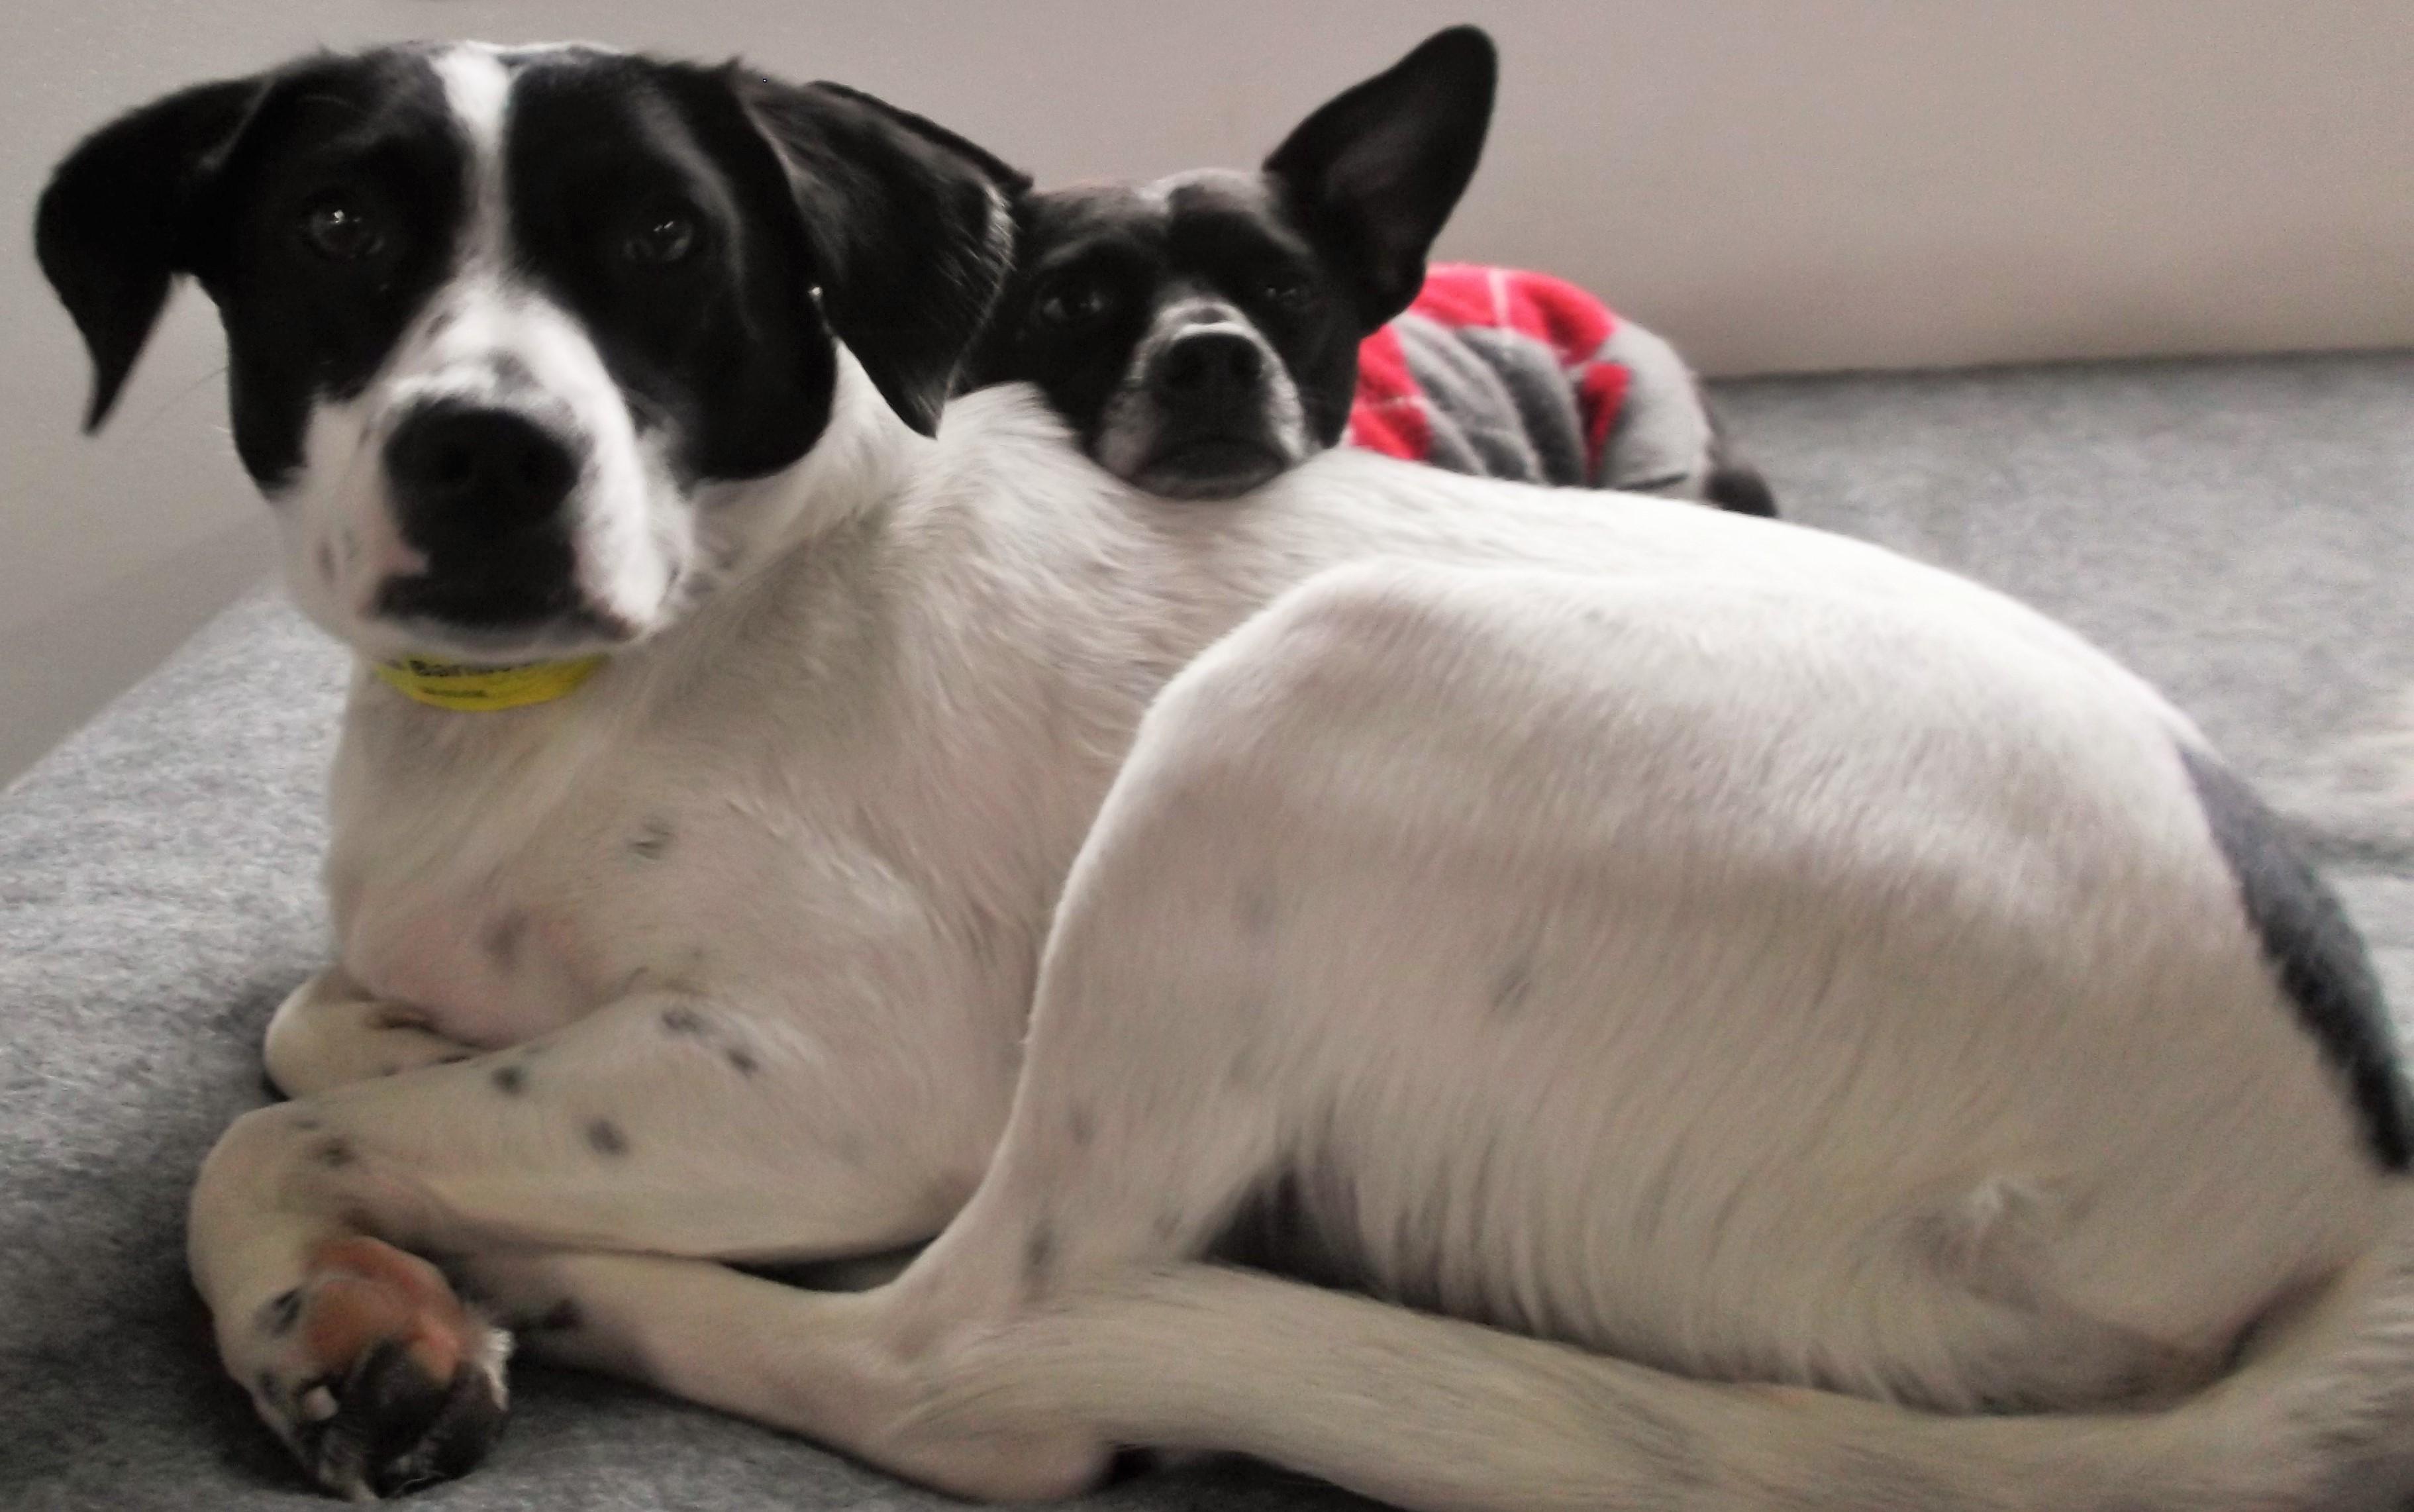 Archie & Tess